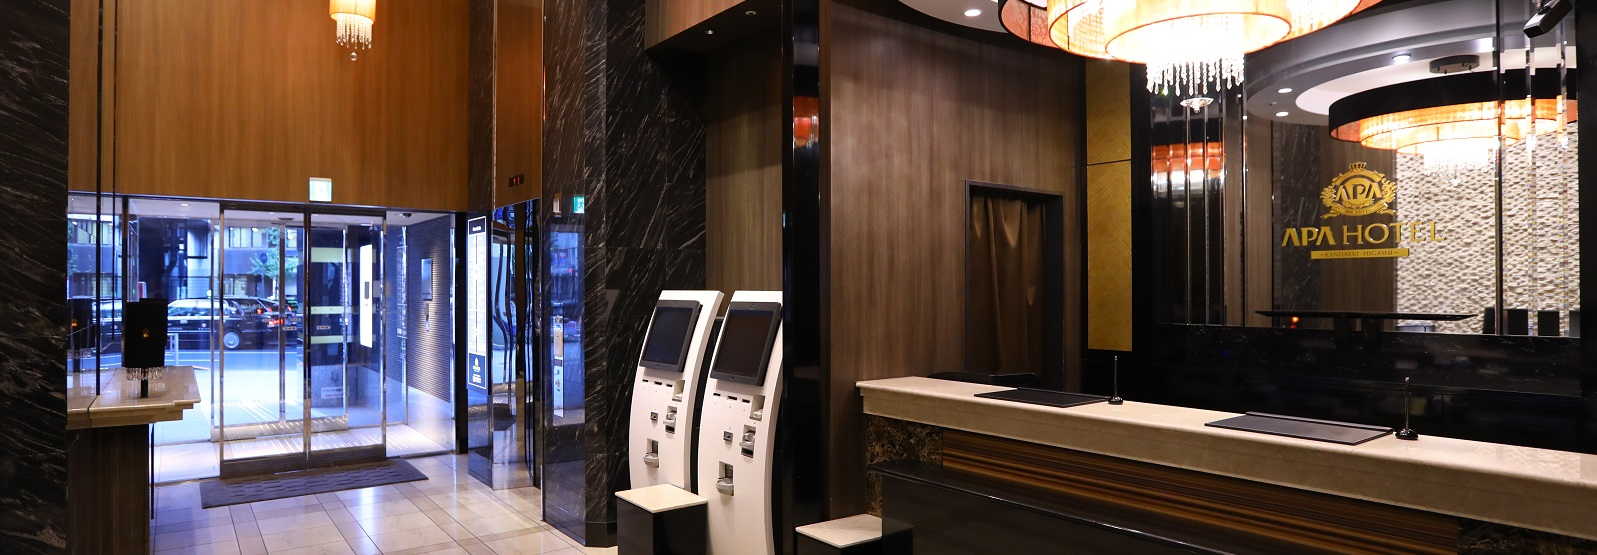 APA Hotel <the Kanda Station east>